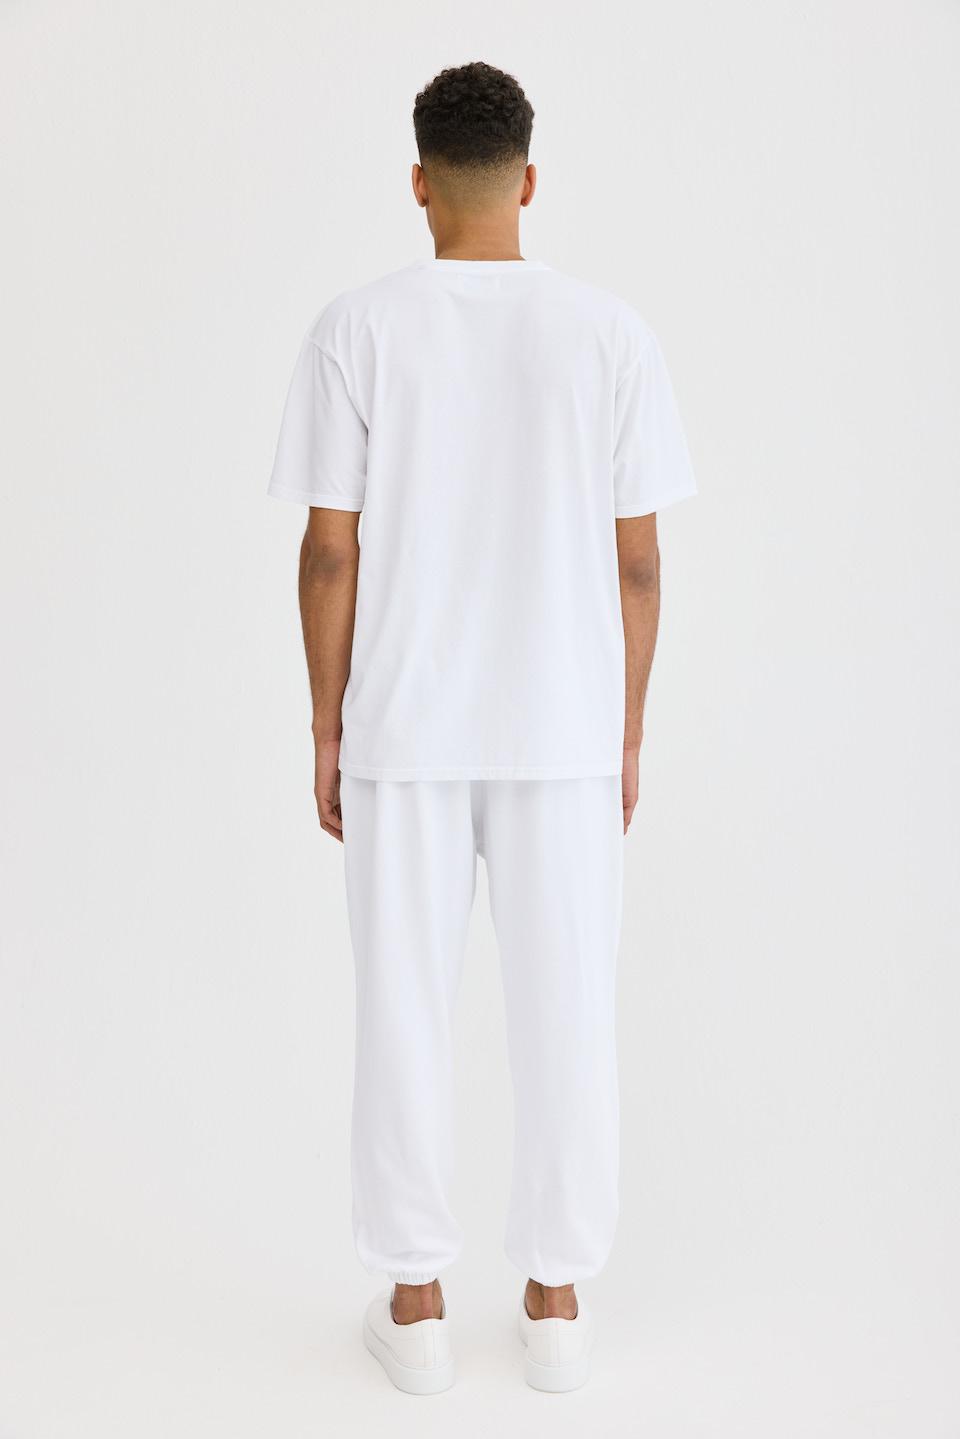 CPH Shirt 1M org. cotton white - alternative 1